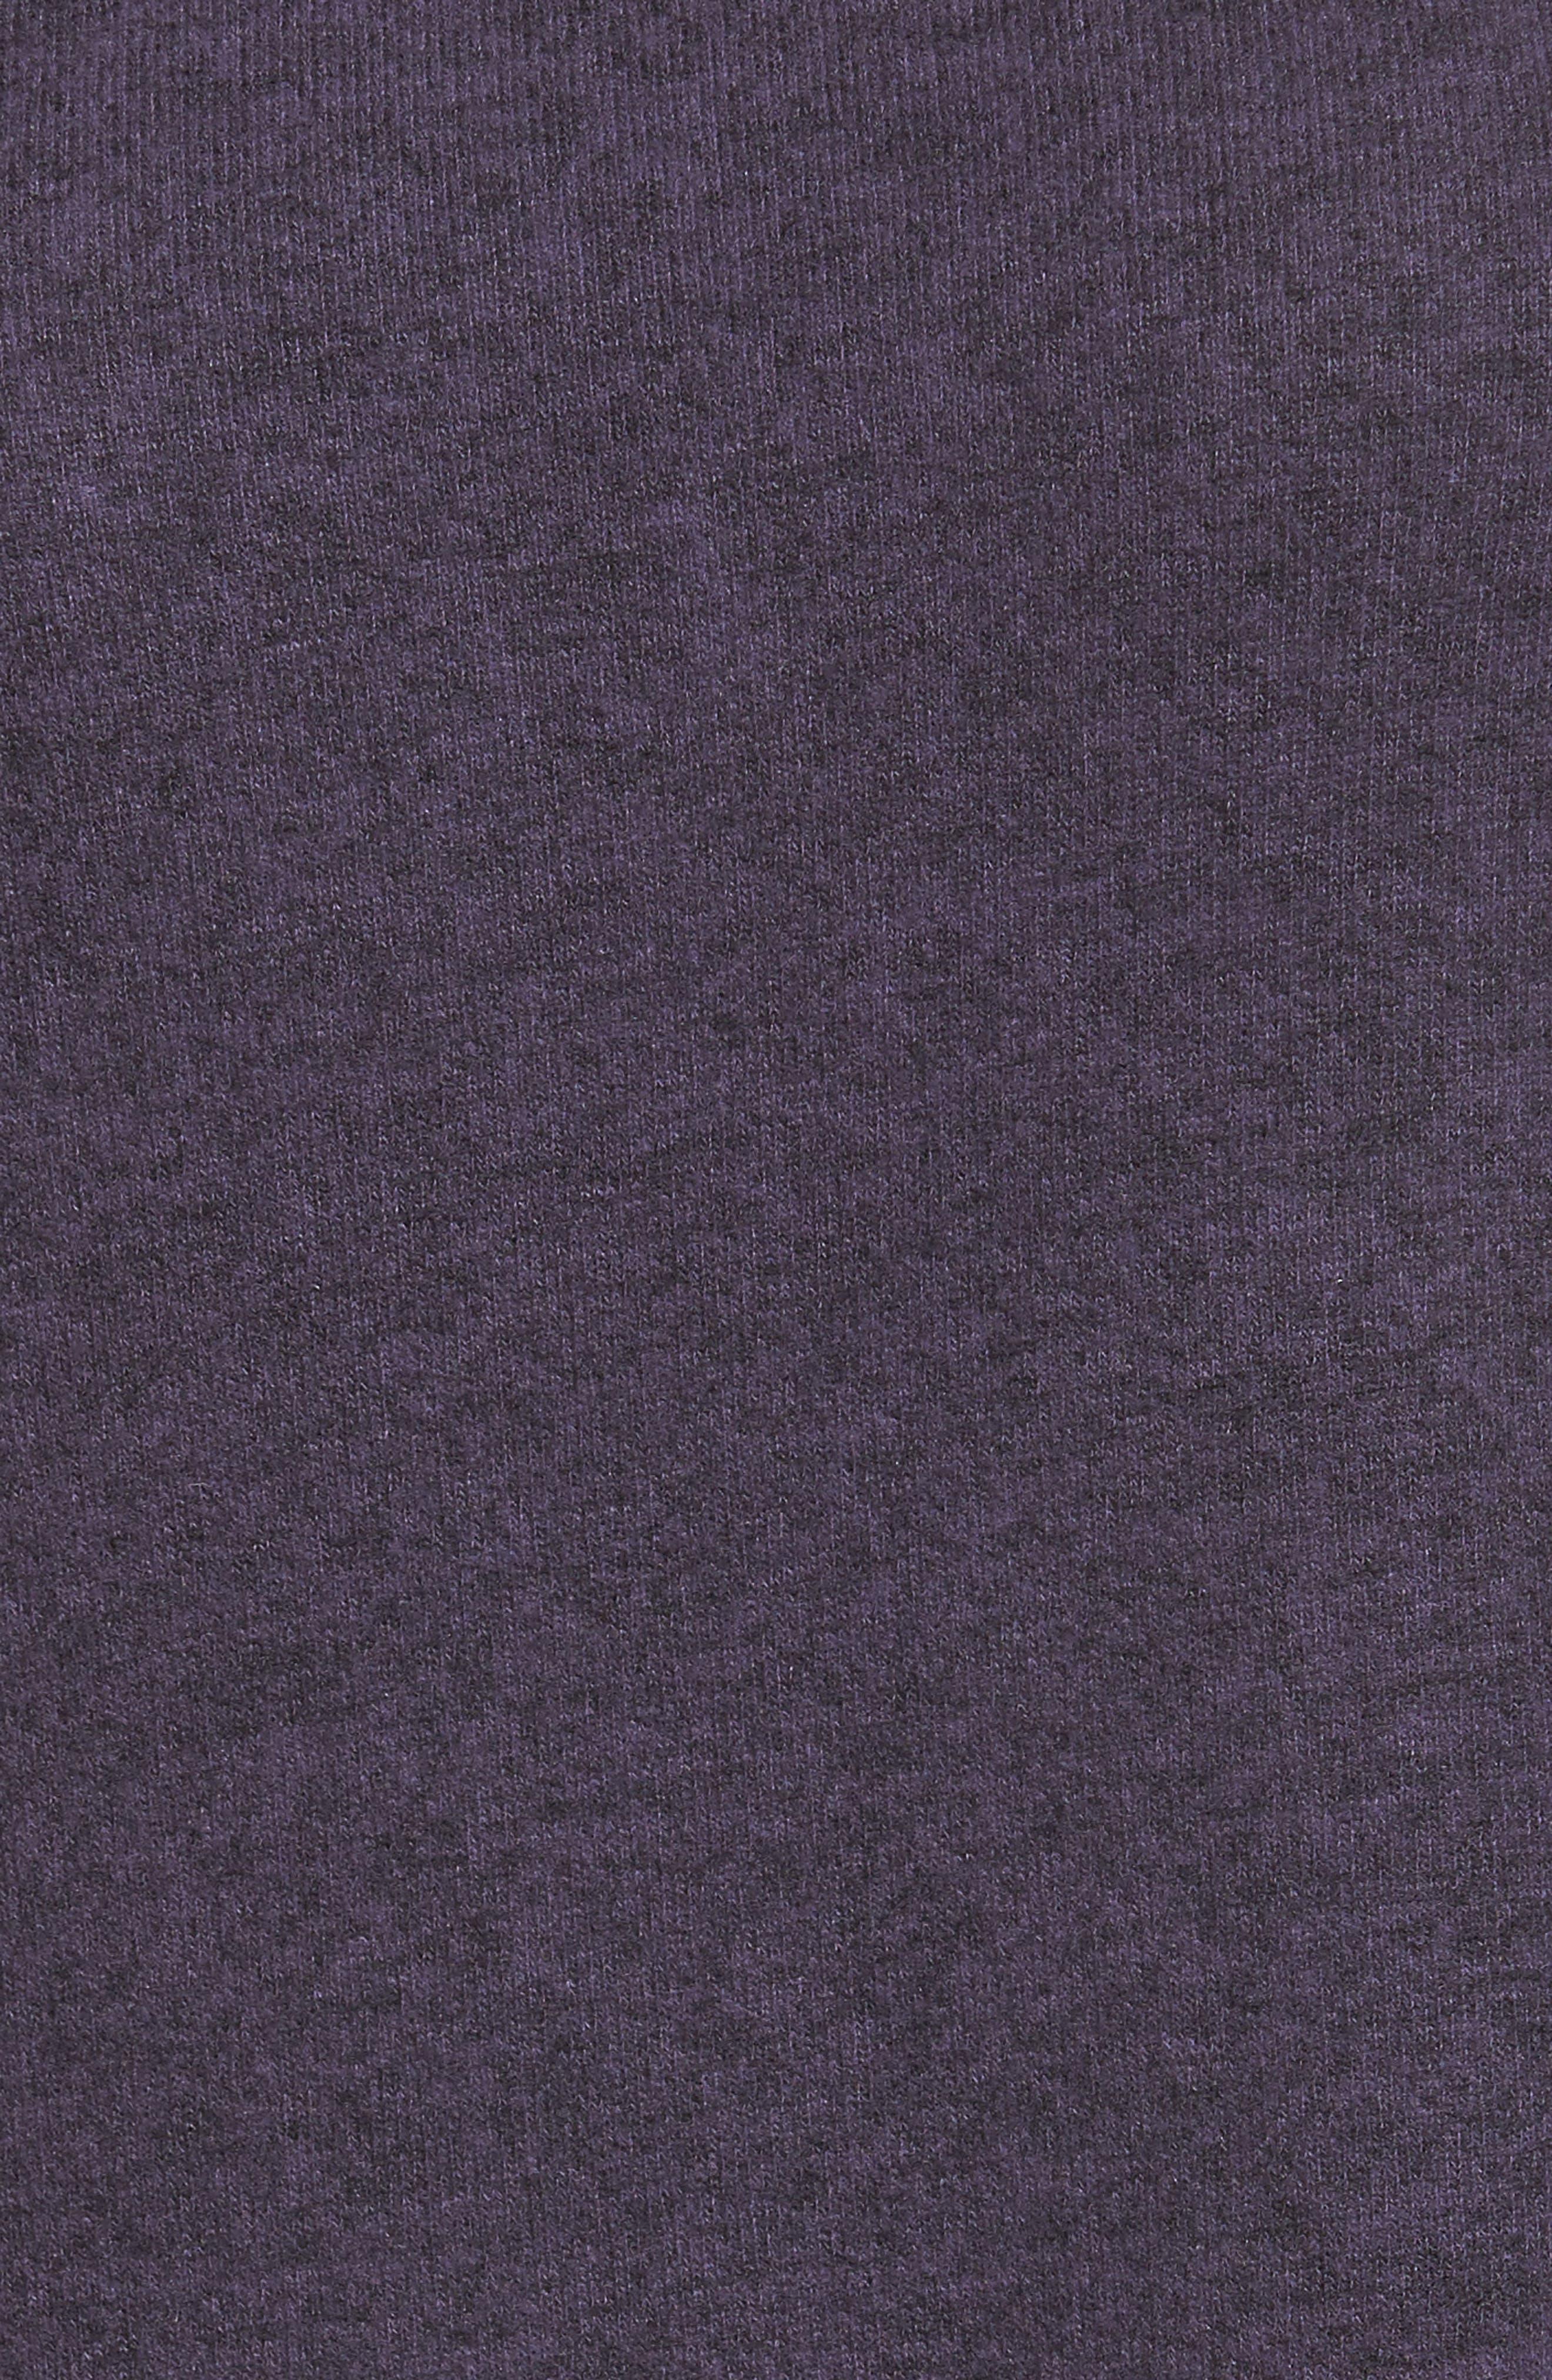 Bell Sleeve Cozy Fleece Pullover,                             Alternate thumbnail 58, color,